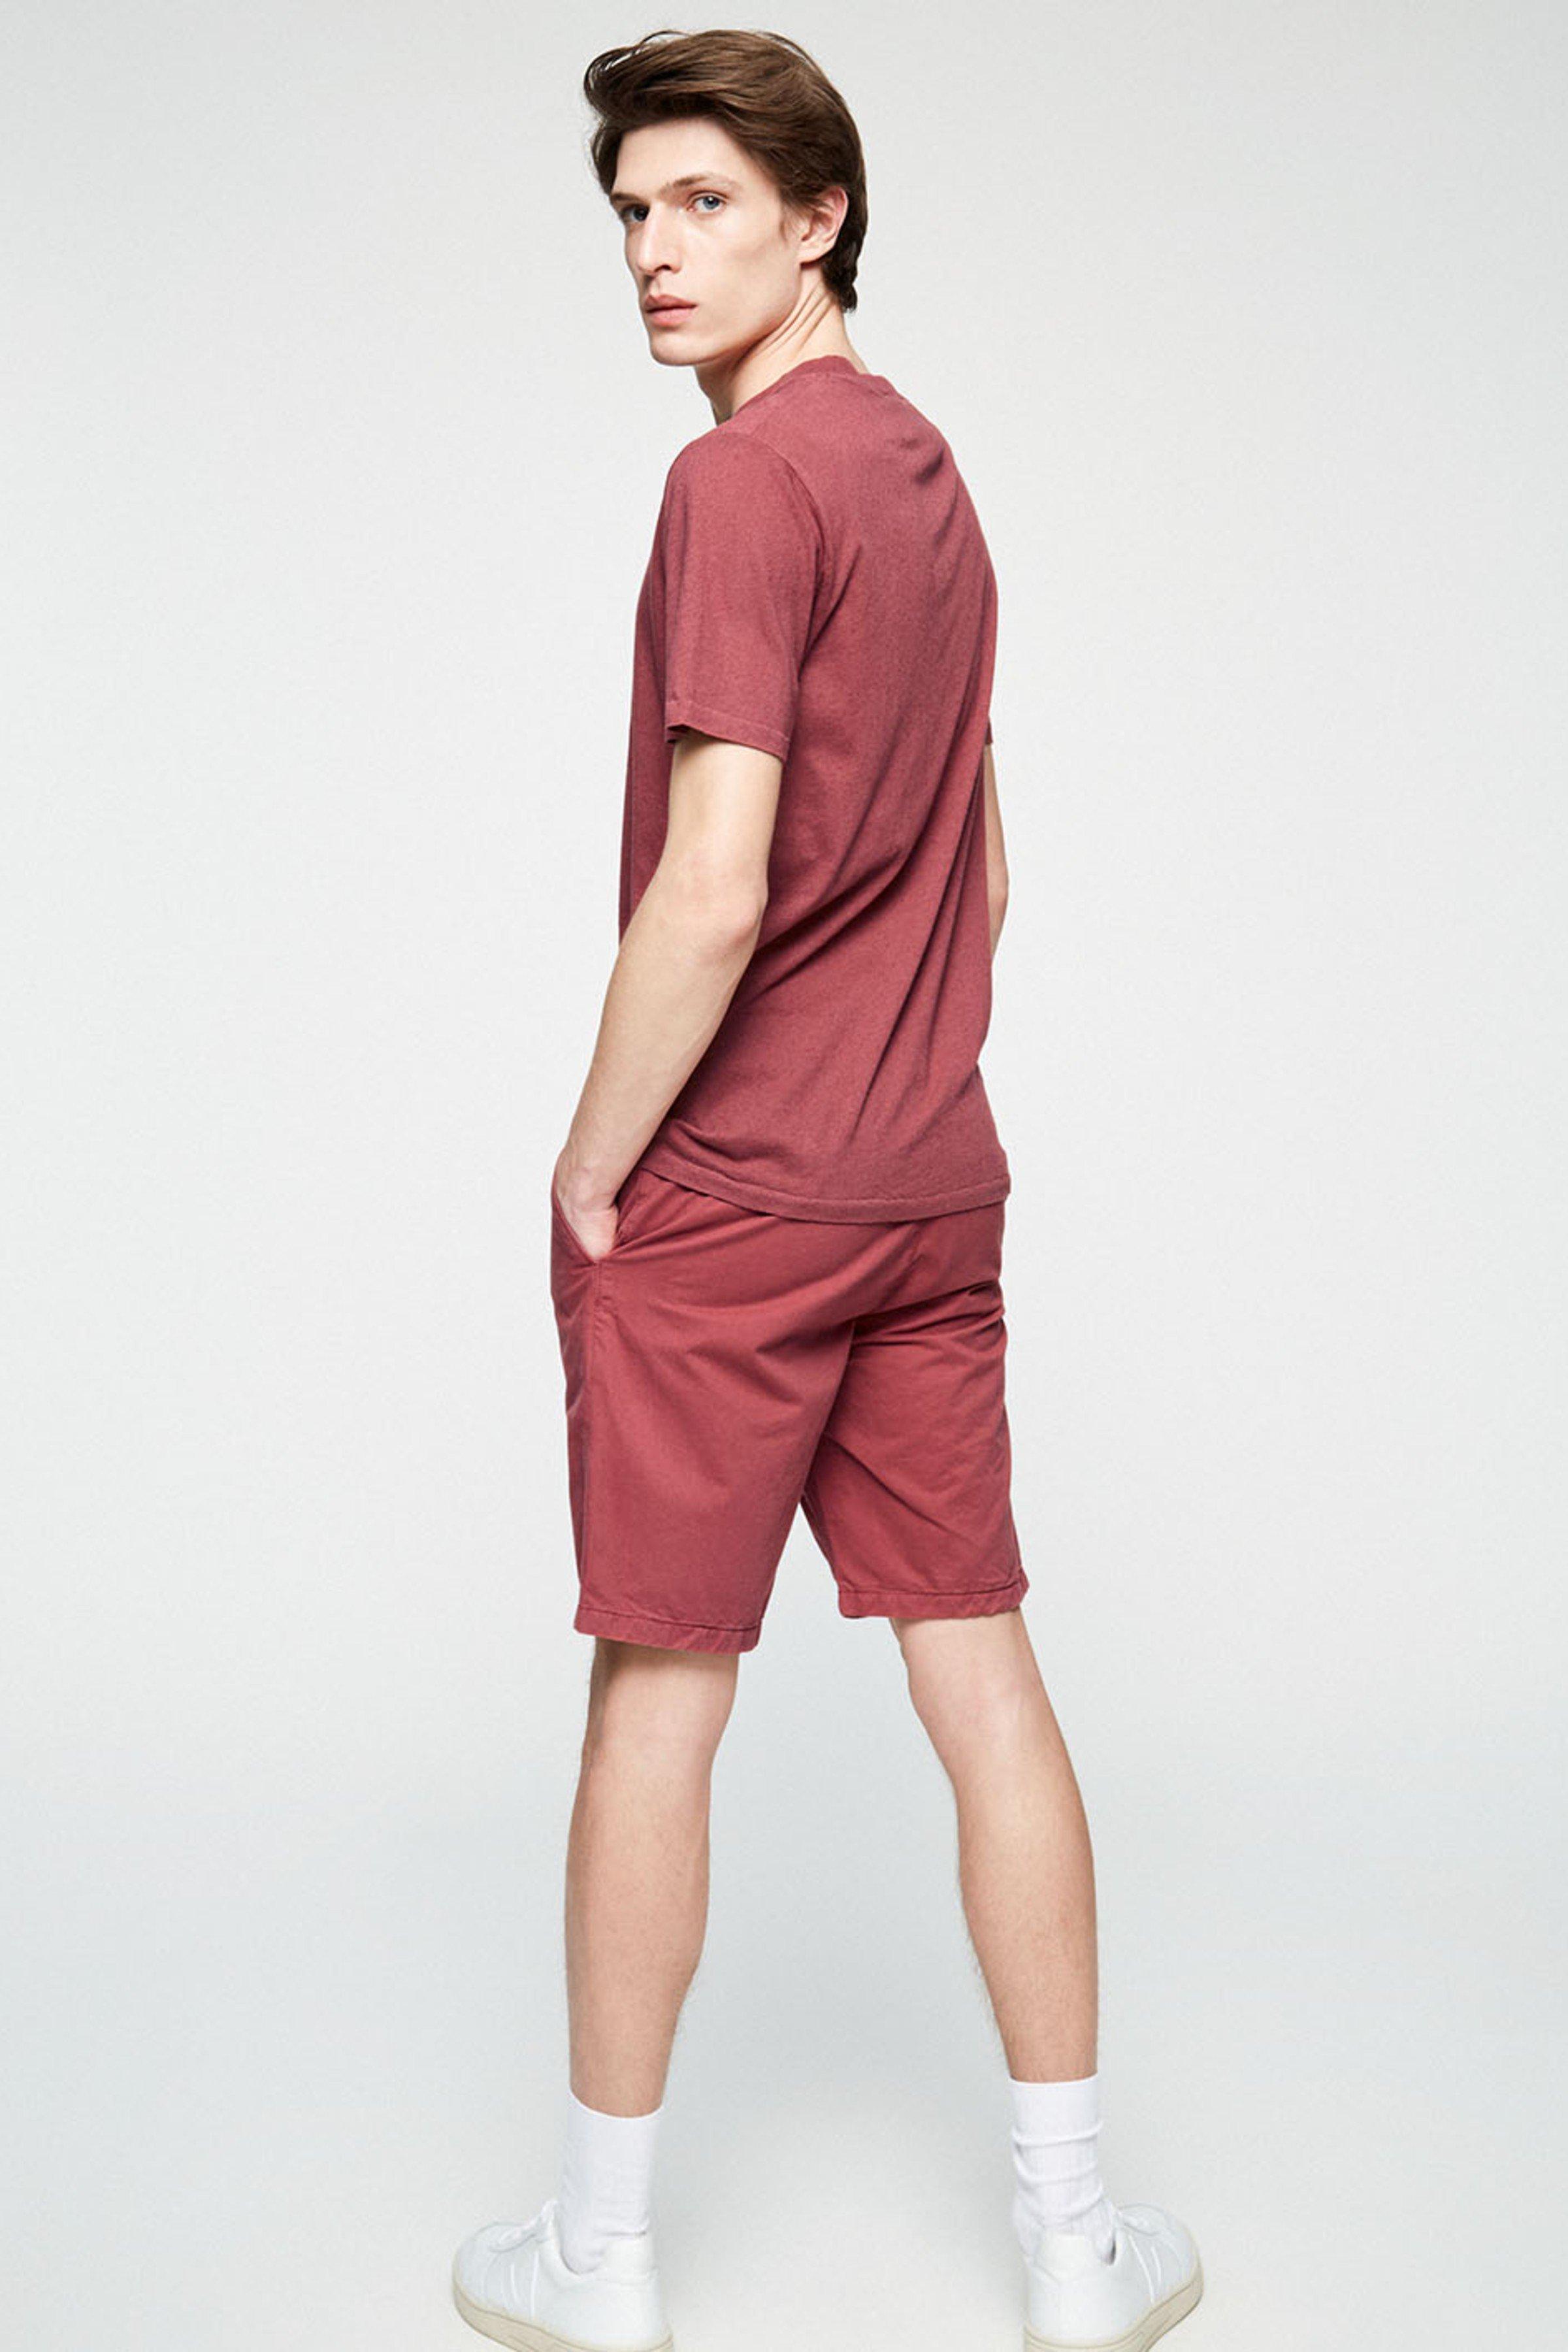 Shorts Brucaa Dunkelrot from LOVECO